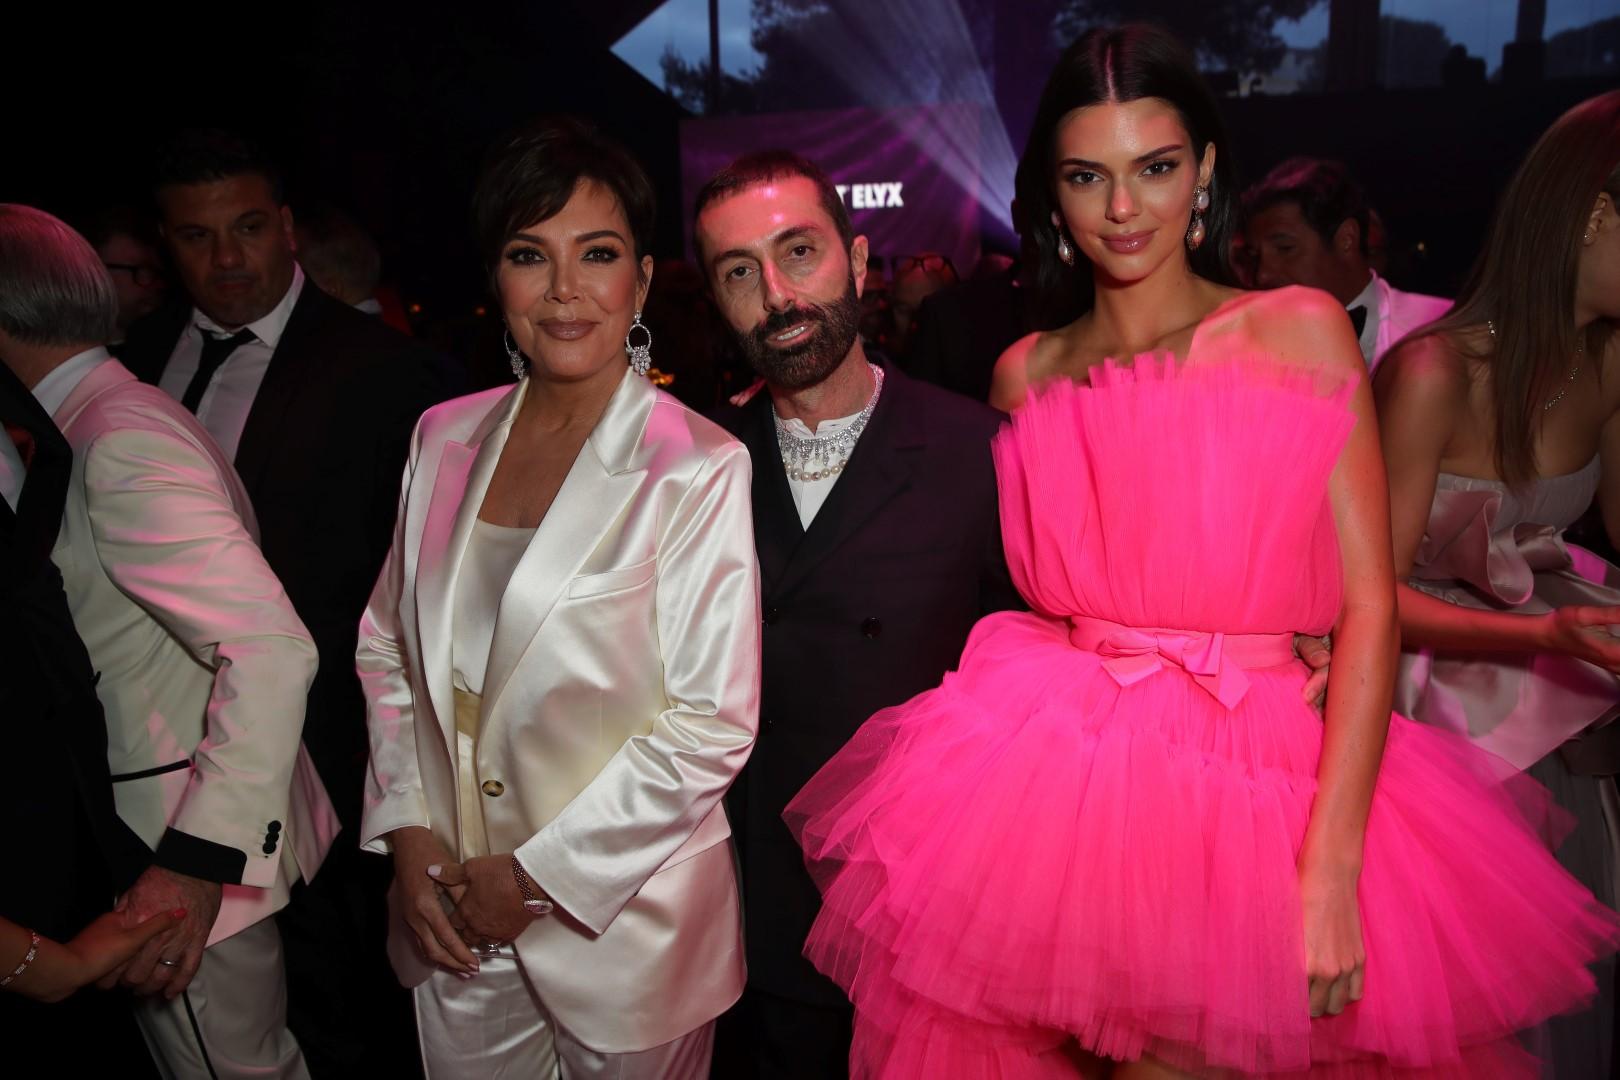 amFar Cannes 2019 red carpet